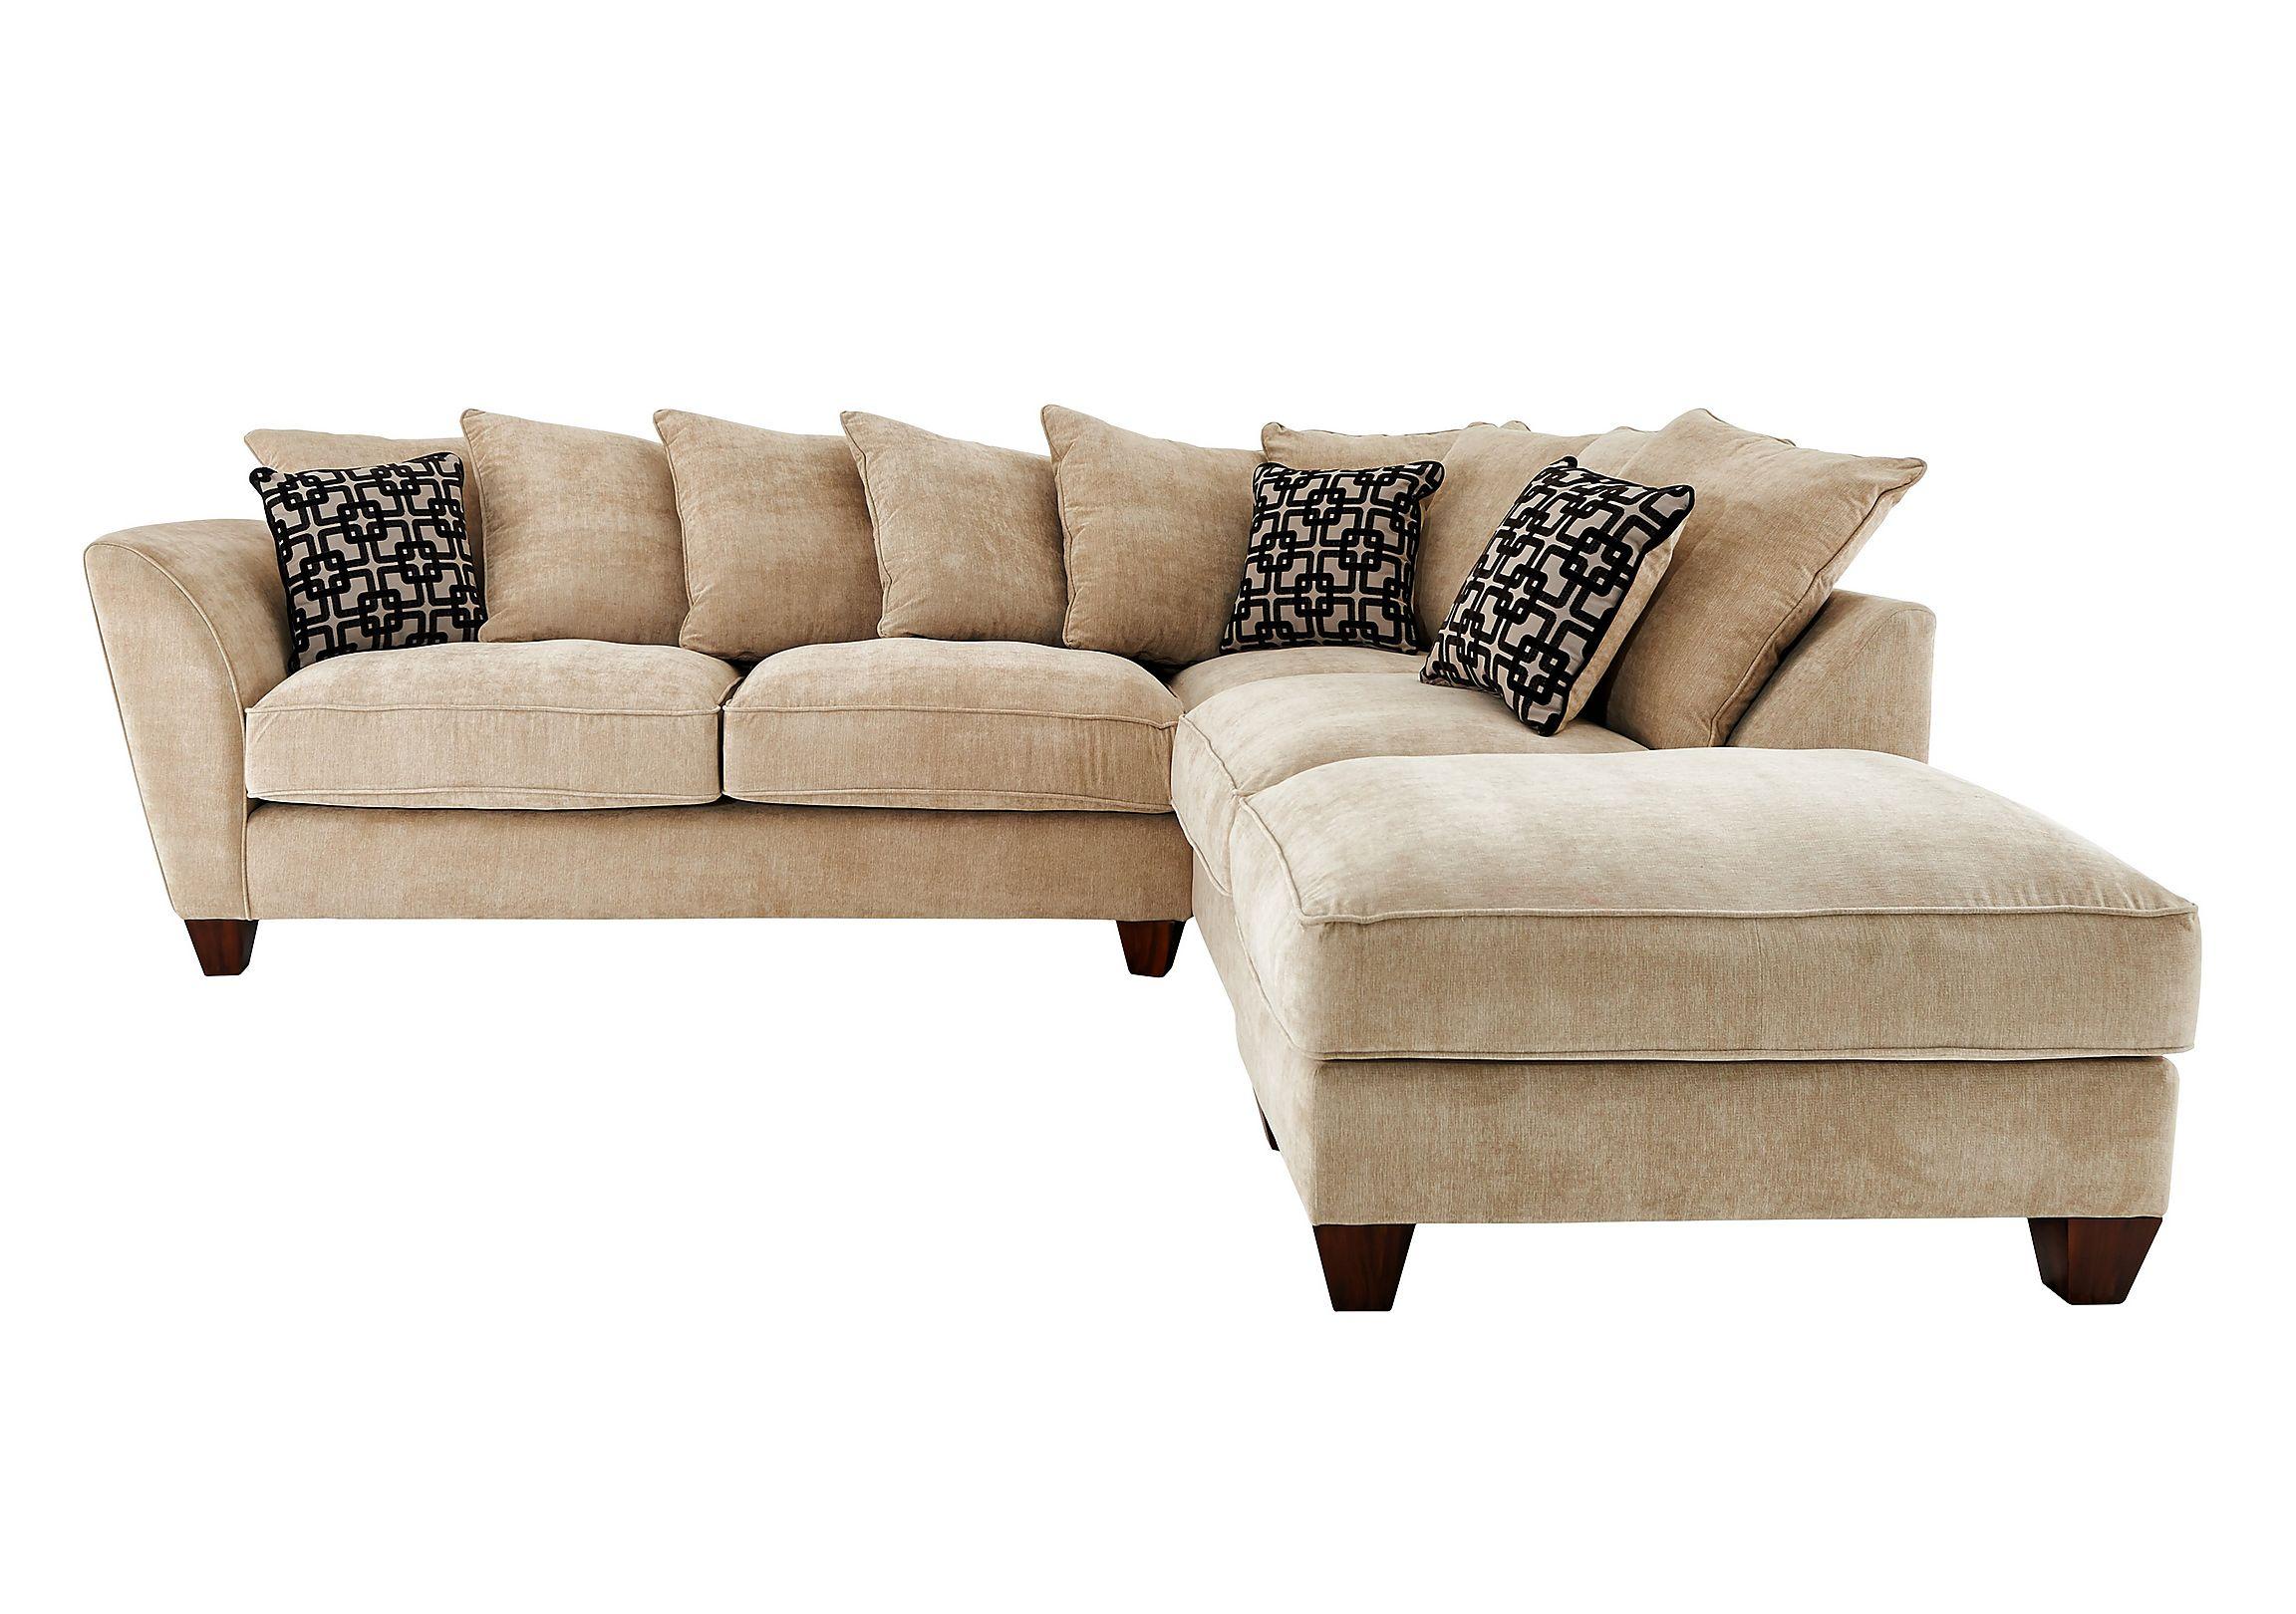 Single sofa bed northern ireland for Sofa bed ireland